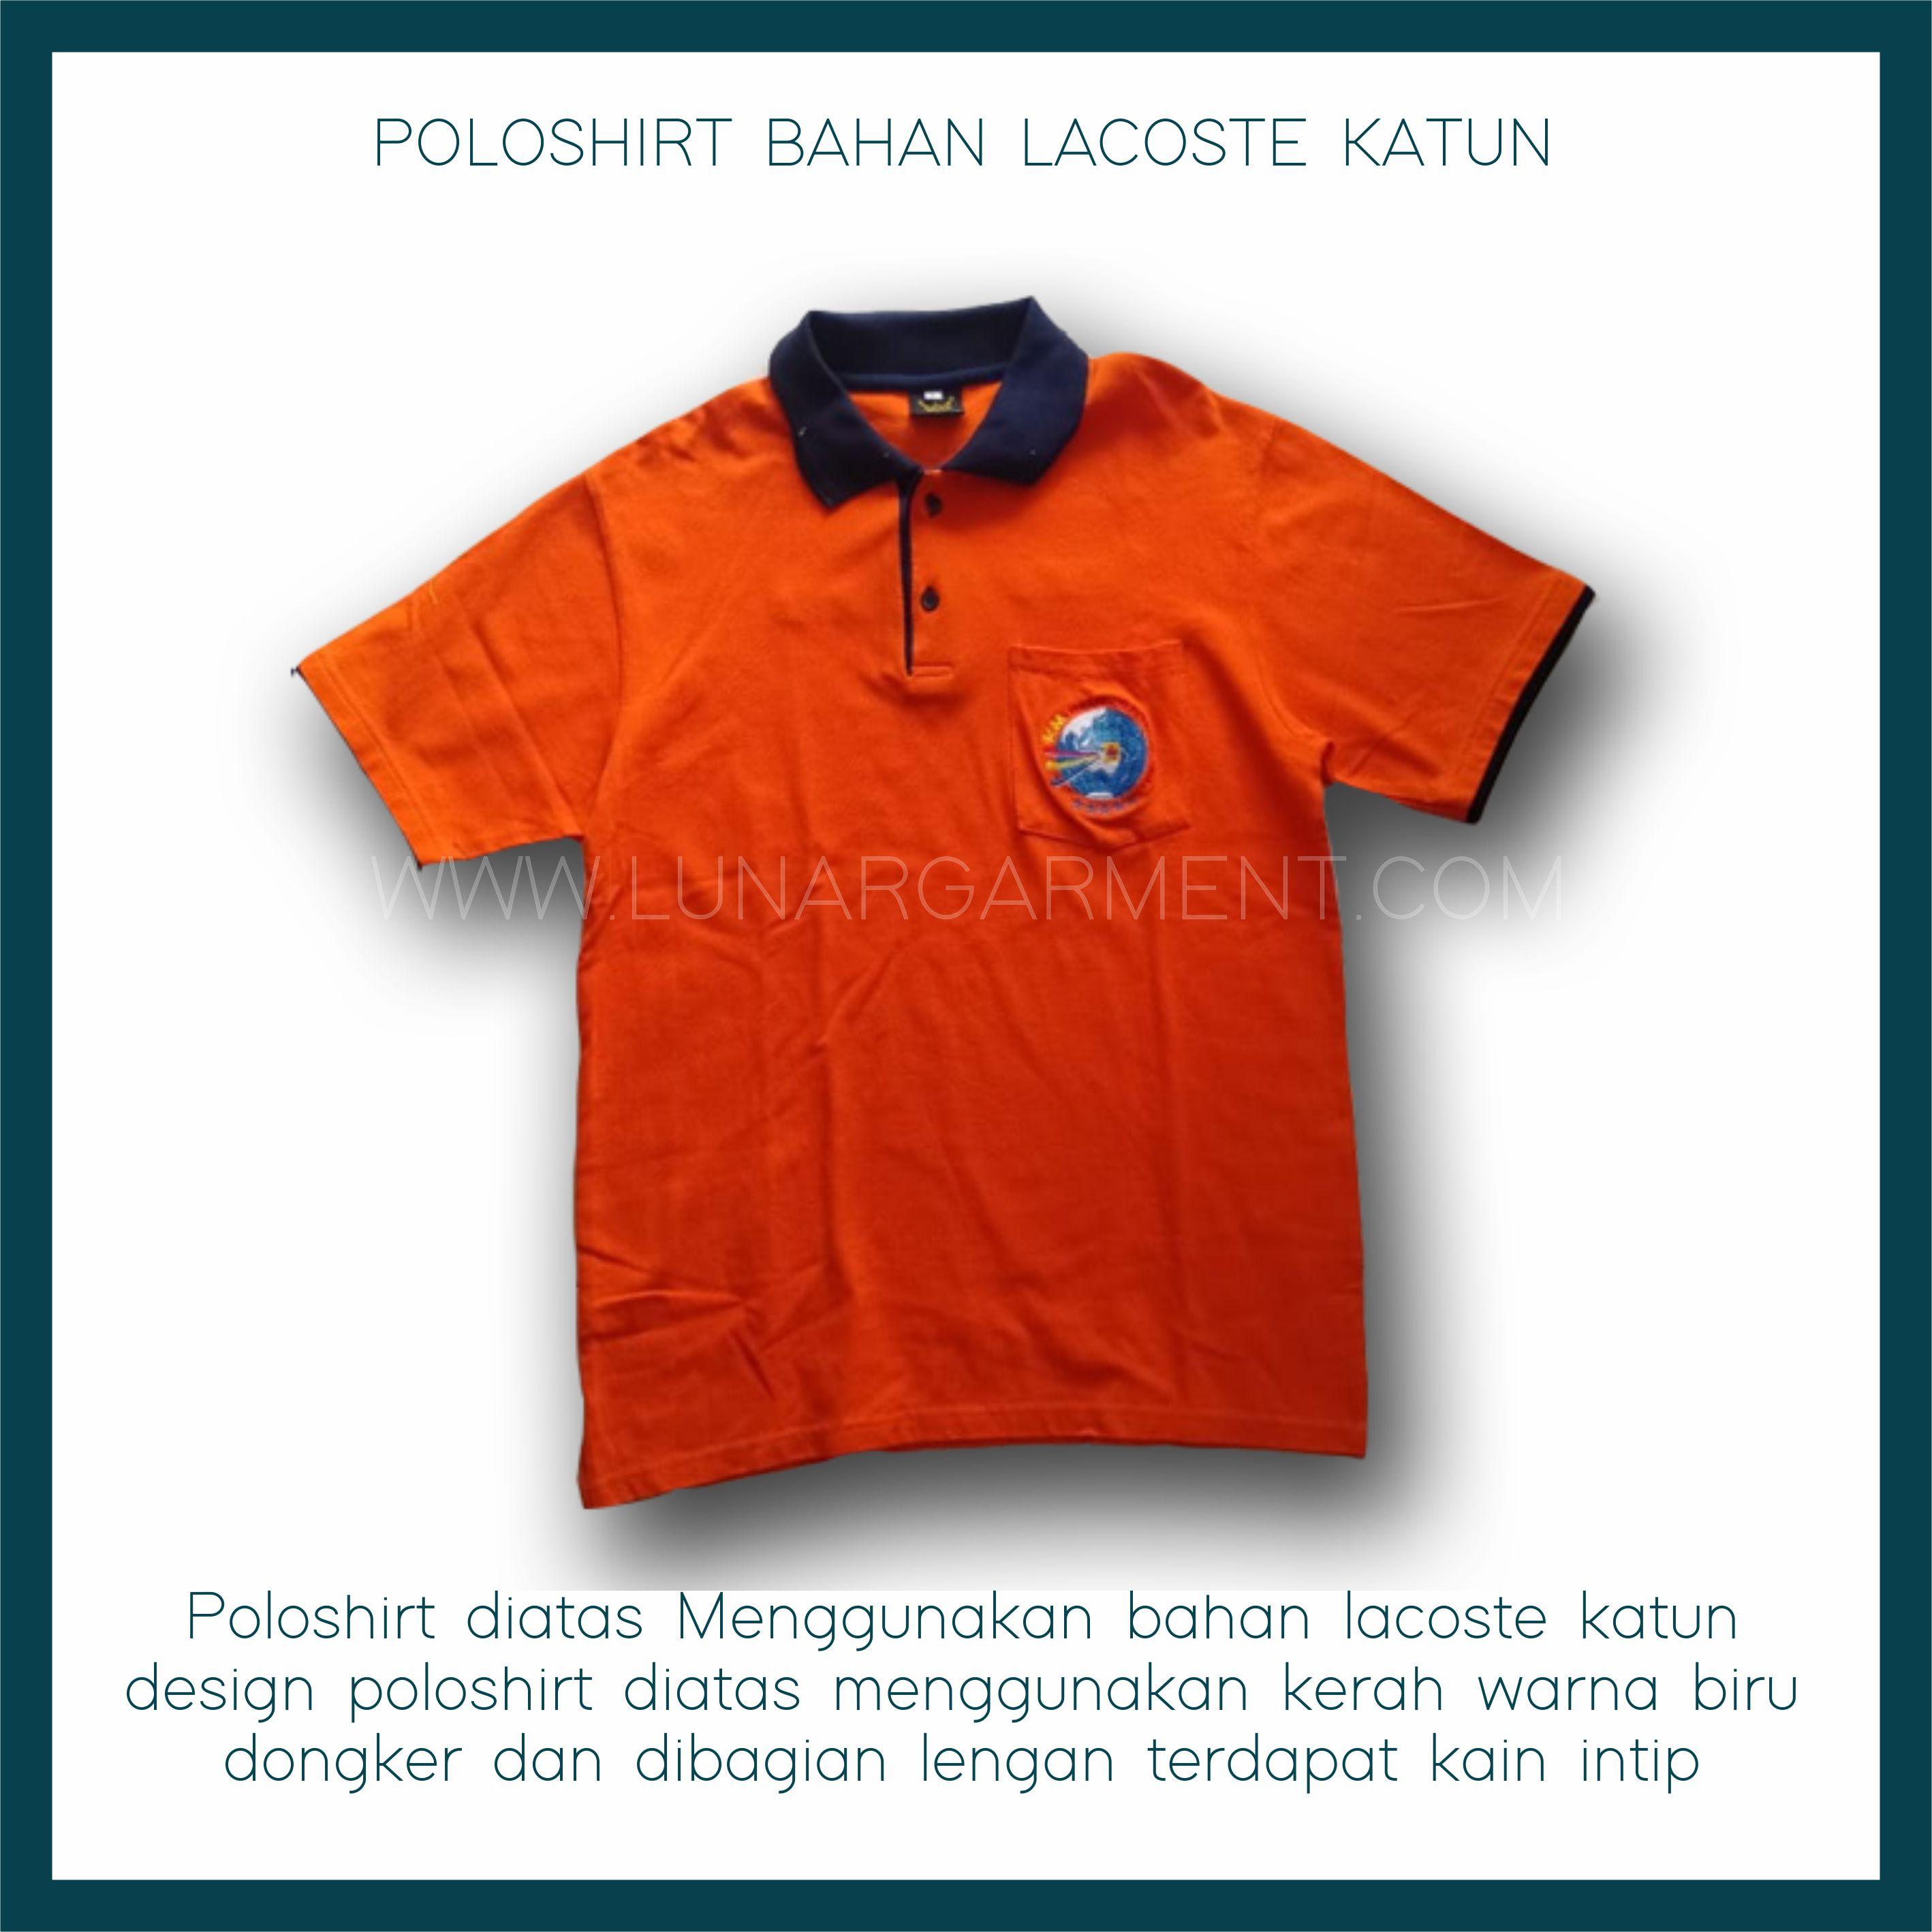 Hasil Produksi Dan Desain Kaos Polo Pt Pln Distribusi Jawa Timur Bahan Lacoste Cotton Lunar Garment Indonesia